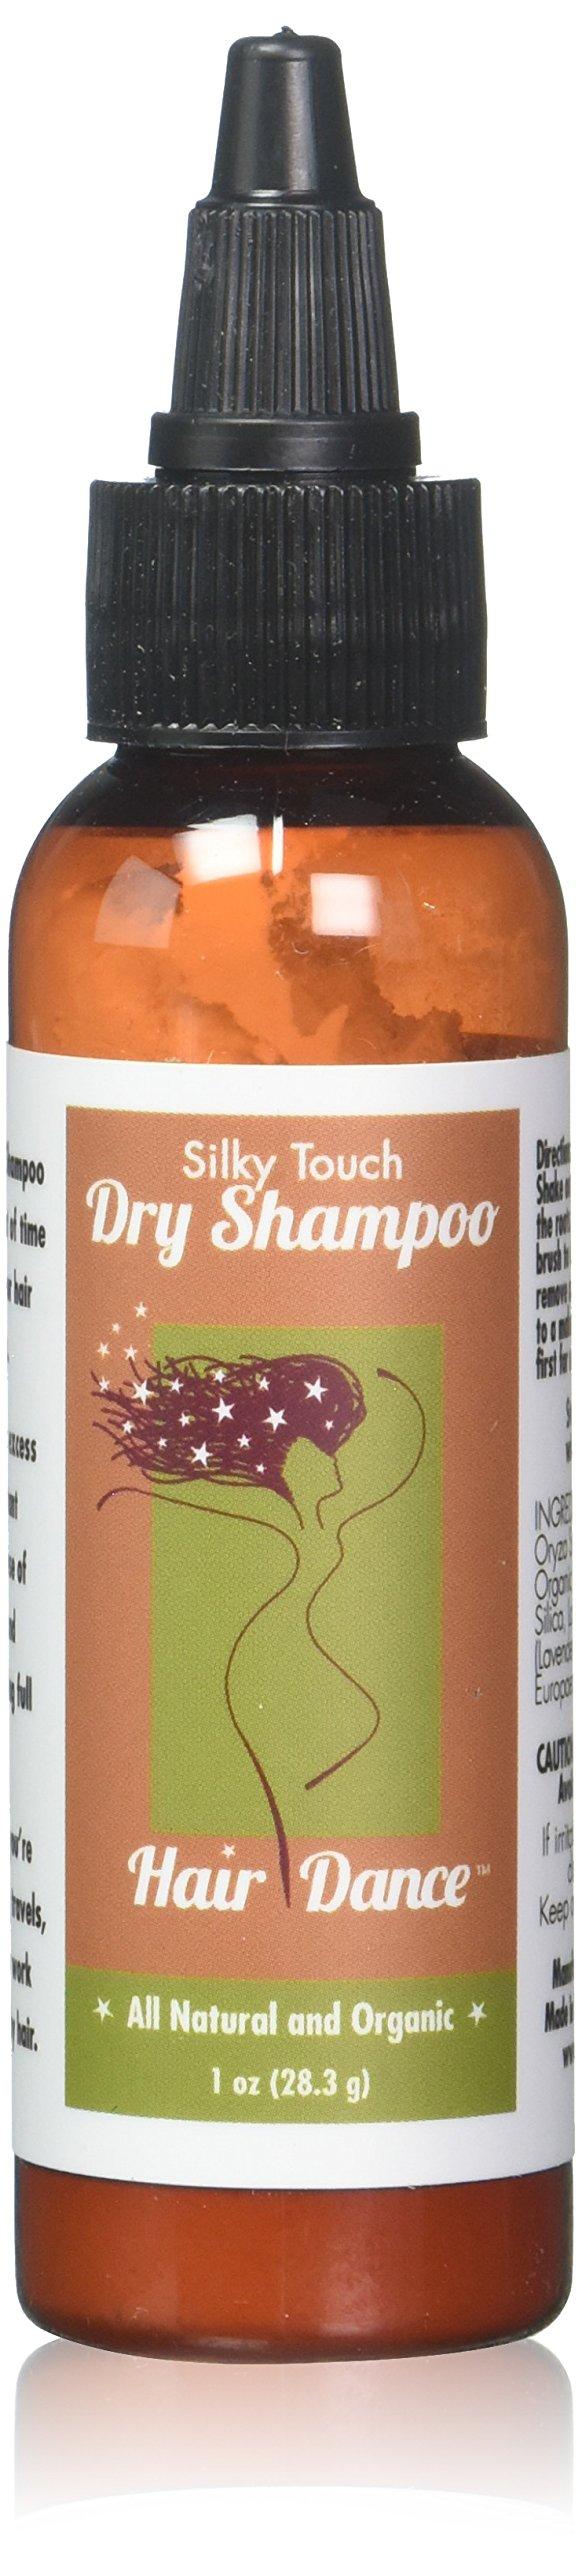 Amazon.com: Klorane Dry Shampoo with Oat Milk - Non